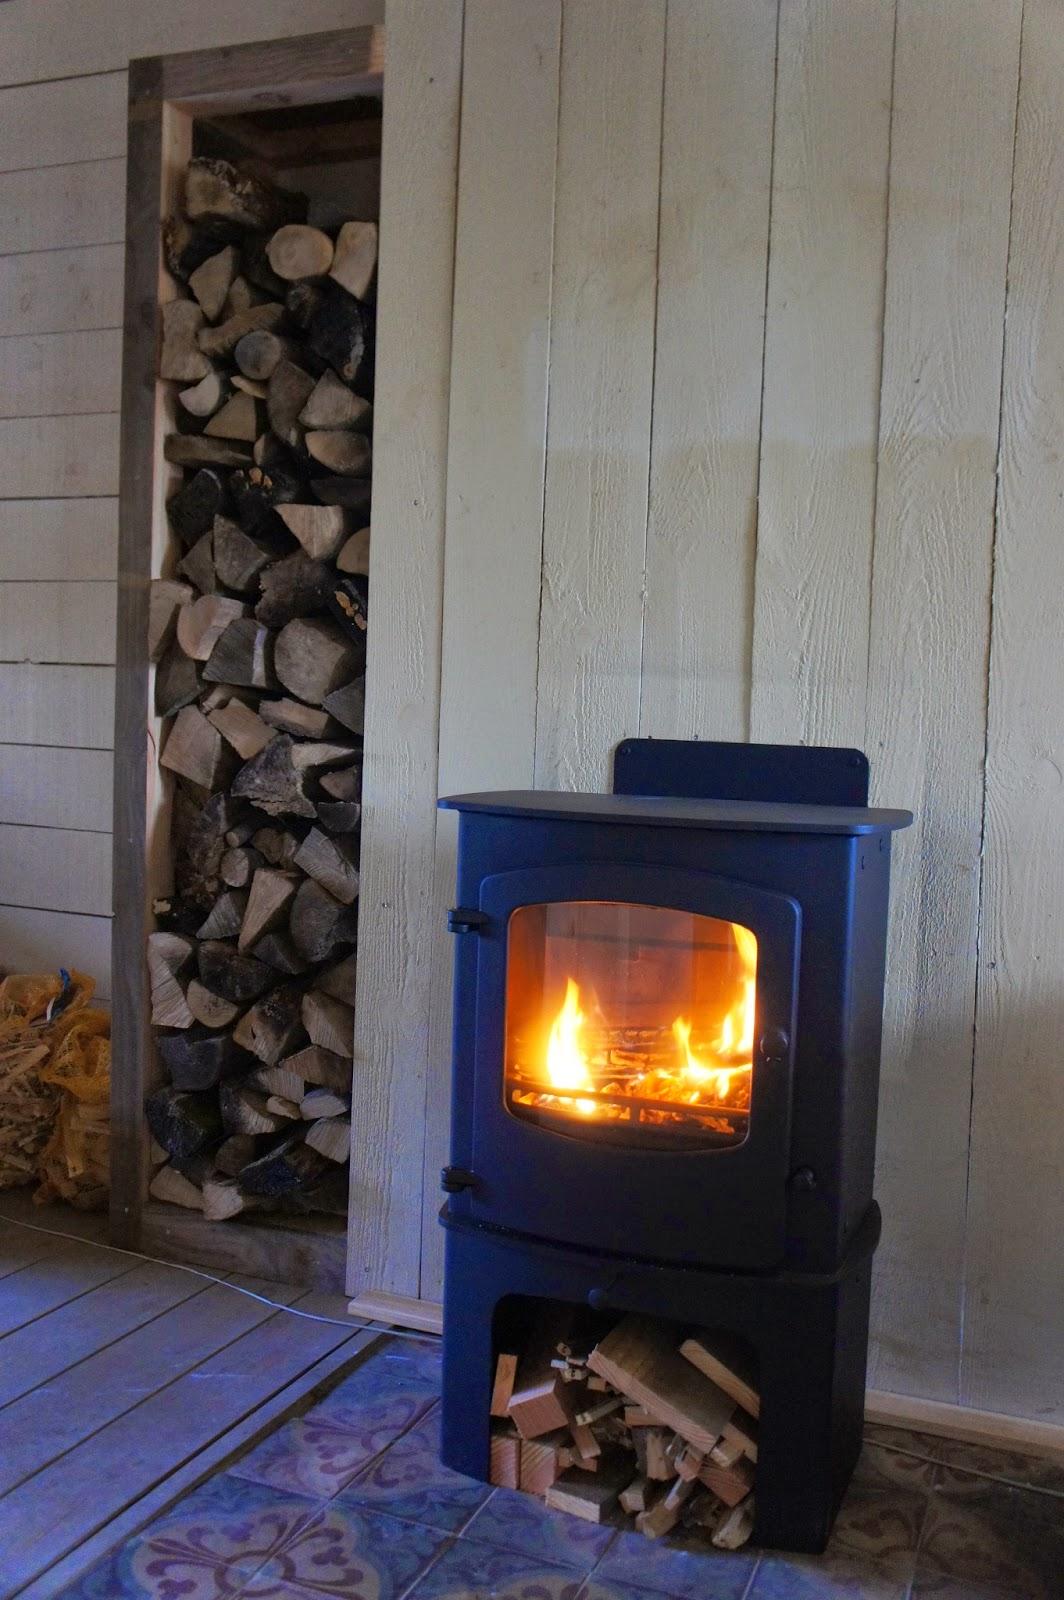 sous le ciel ardennais 1er avril 15 neige et feu. Black Bedroom Furniture Sets. Home Design Ideas